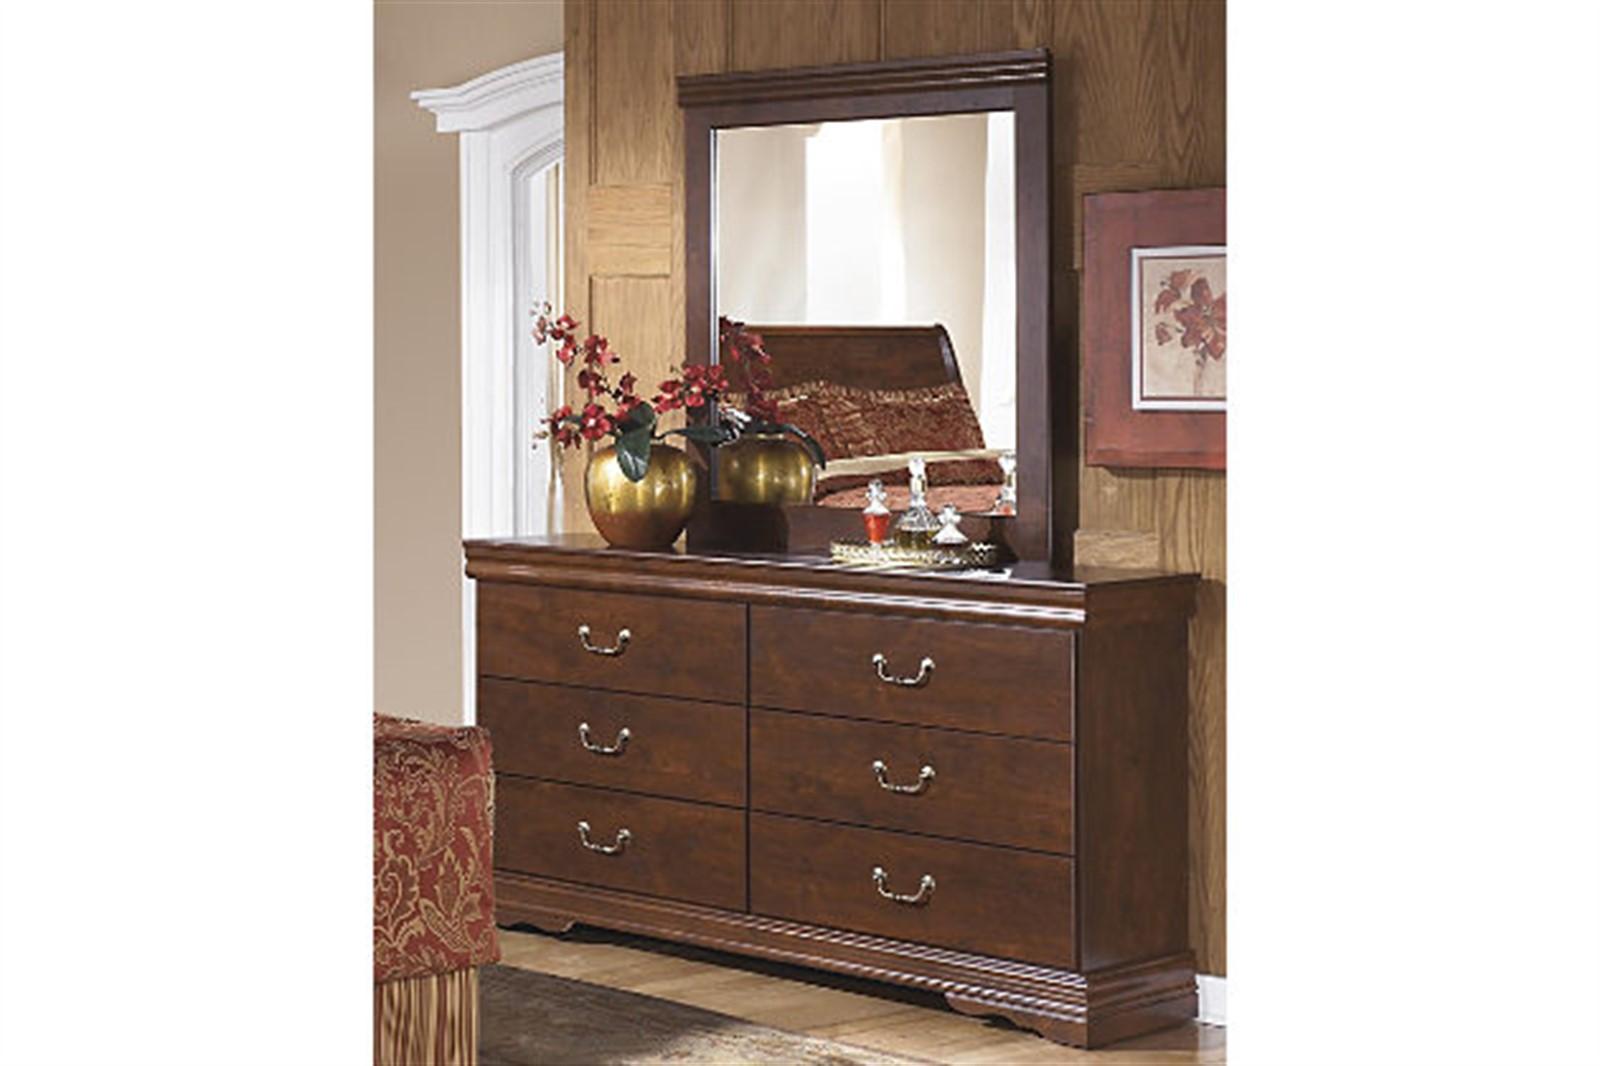 Wilmington Dresser and Mirror Set - Reddish Brown